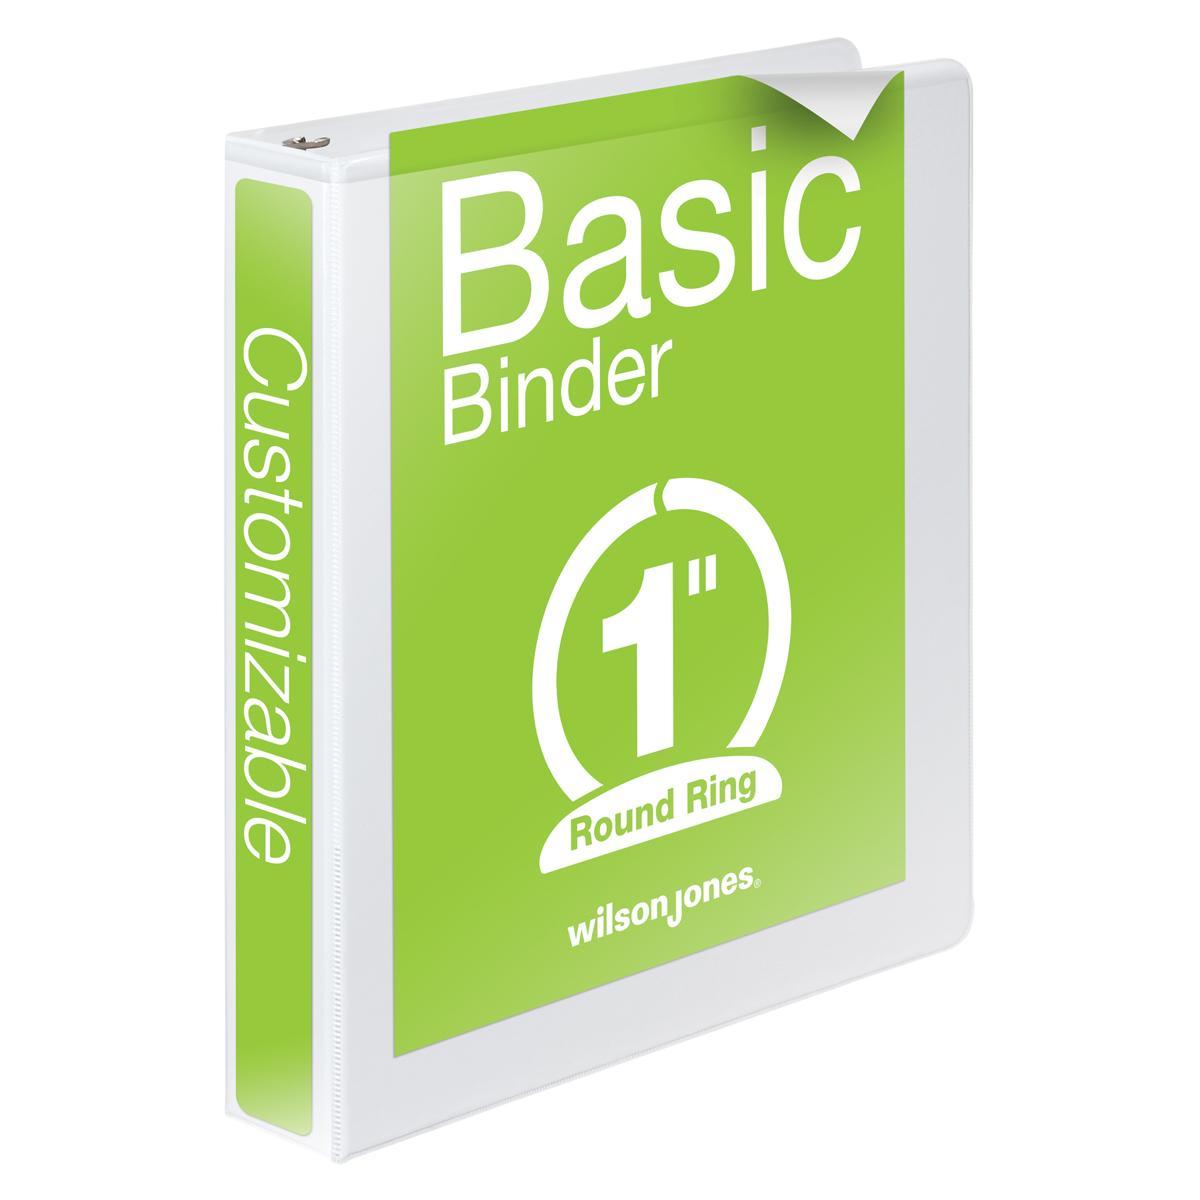 Amazon.com : Wilson Jones 1 Inch 3 Ring Binder, Basic